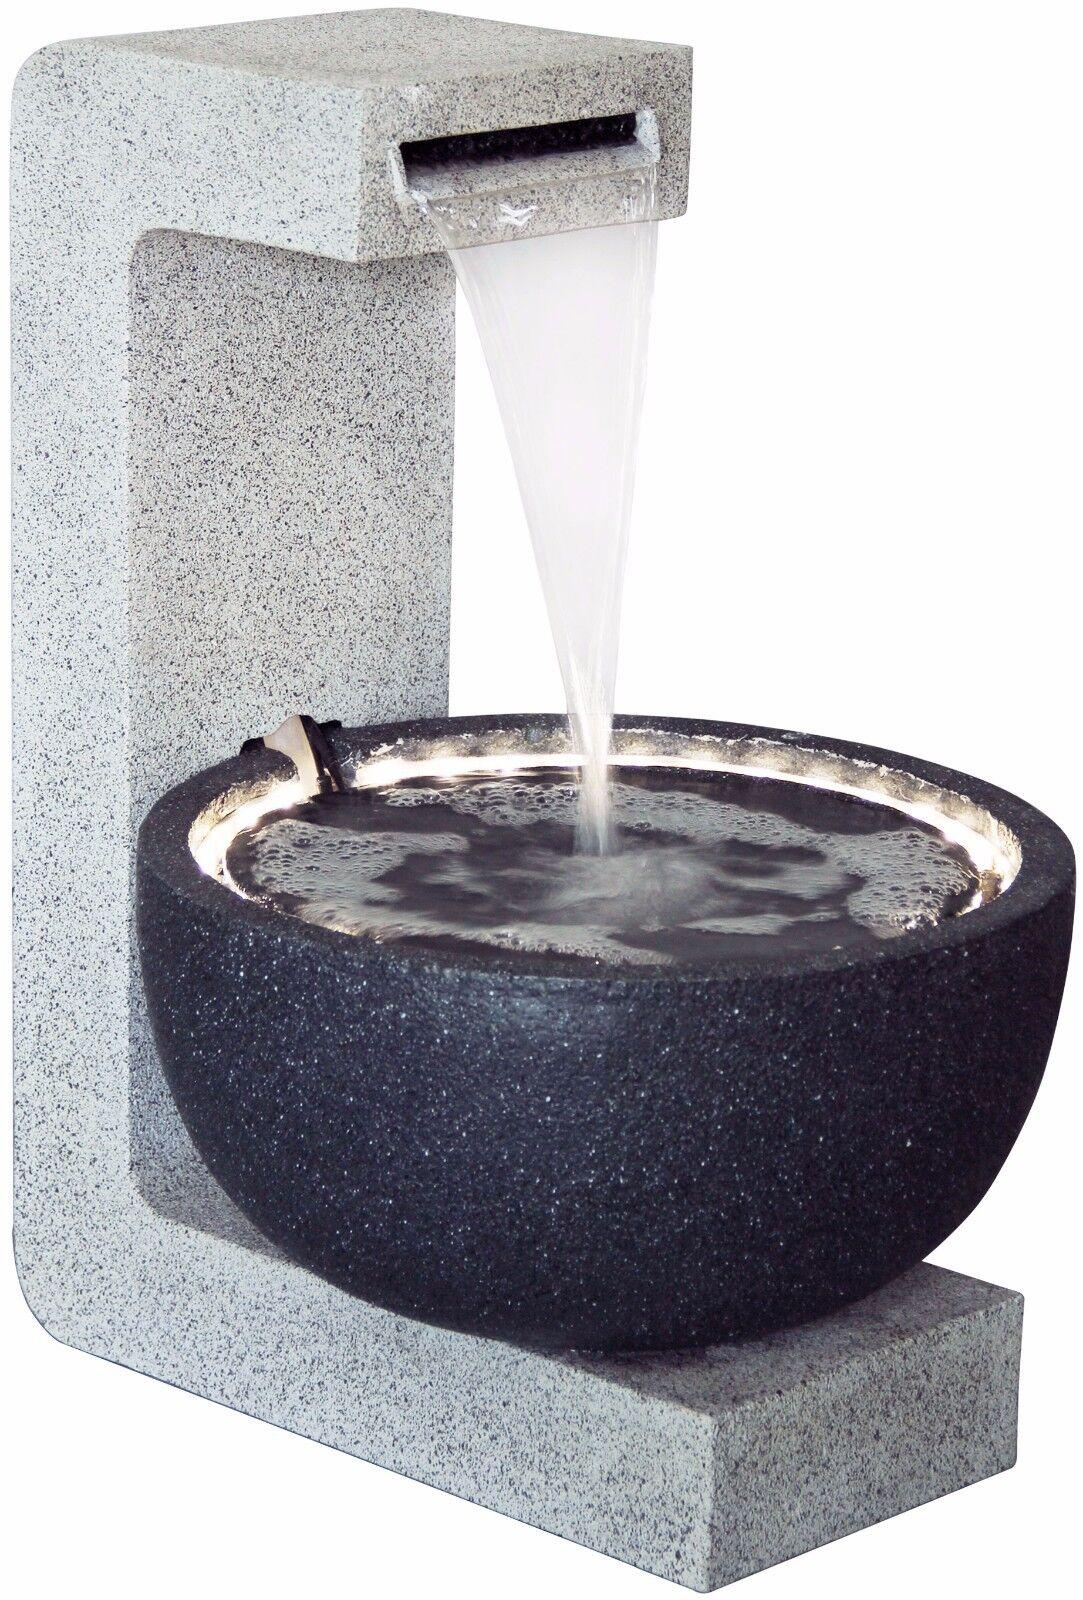 Design Gartenbrunnen Mit Led S Pumpe Garten Spring Brunnen